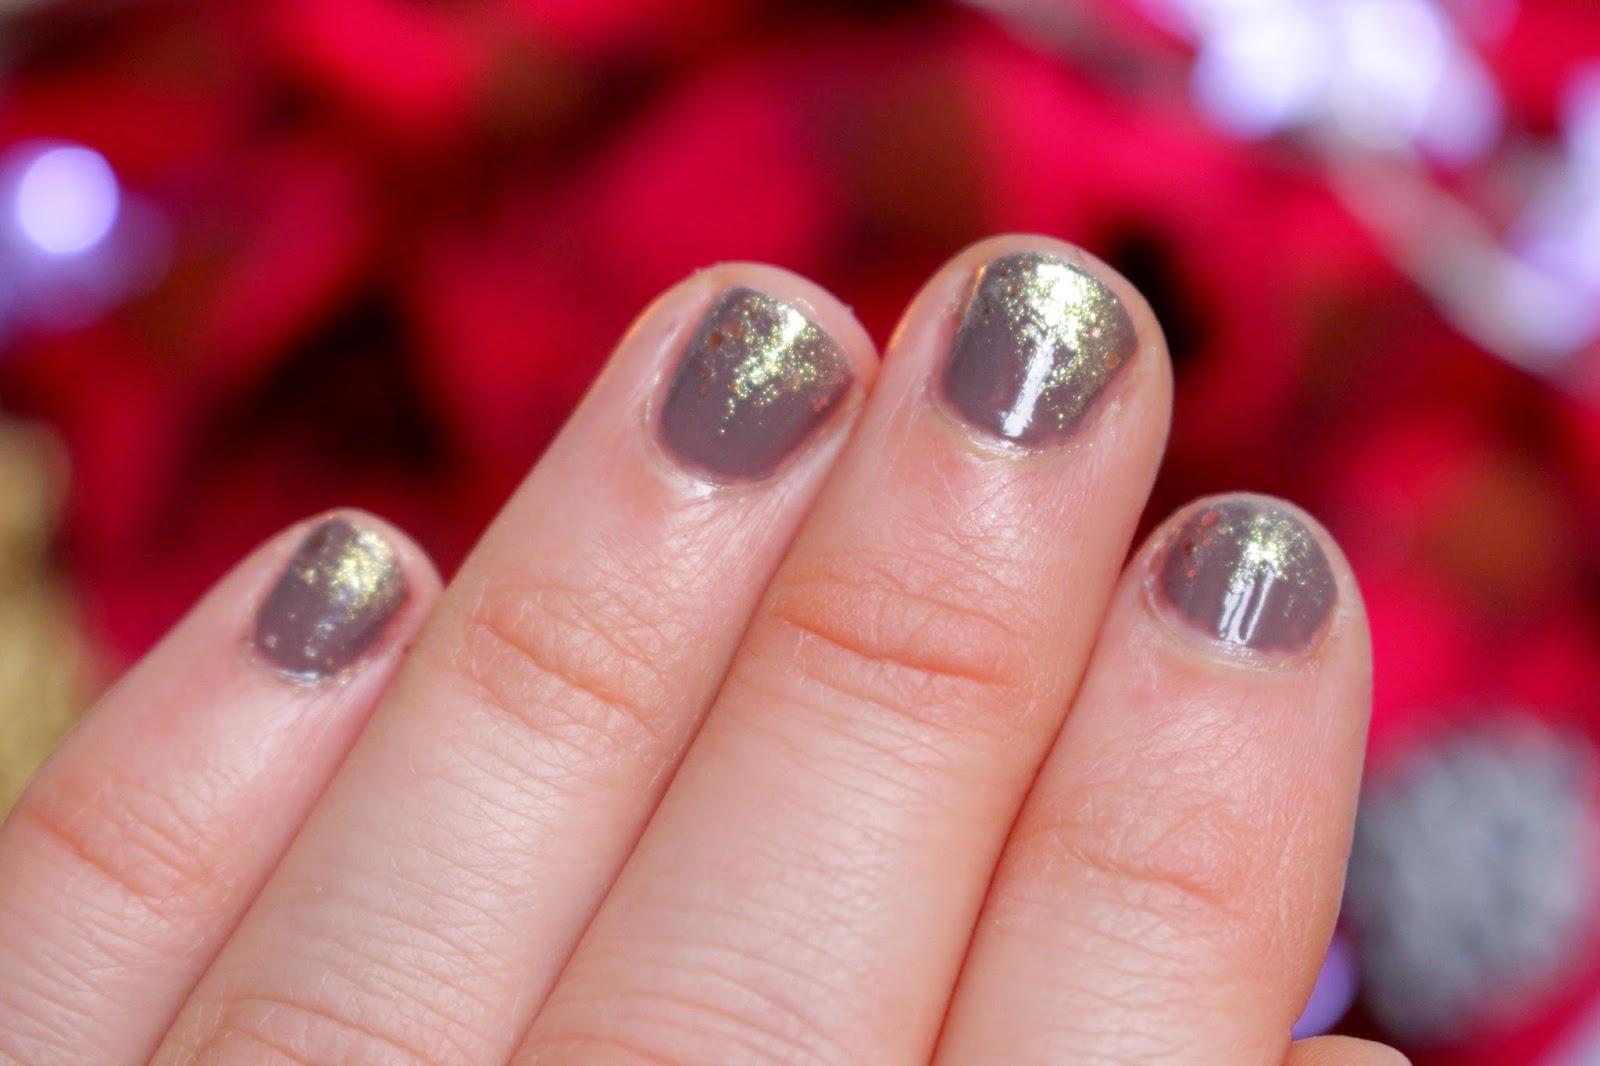 Festive Manicure